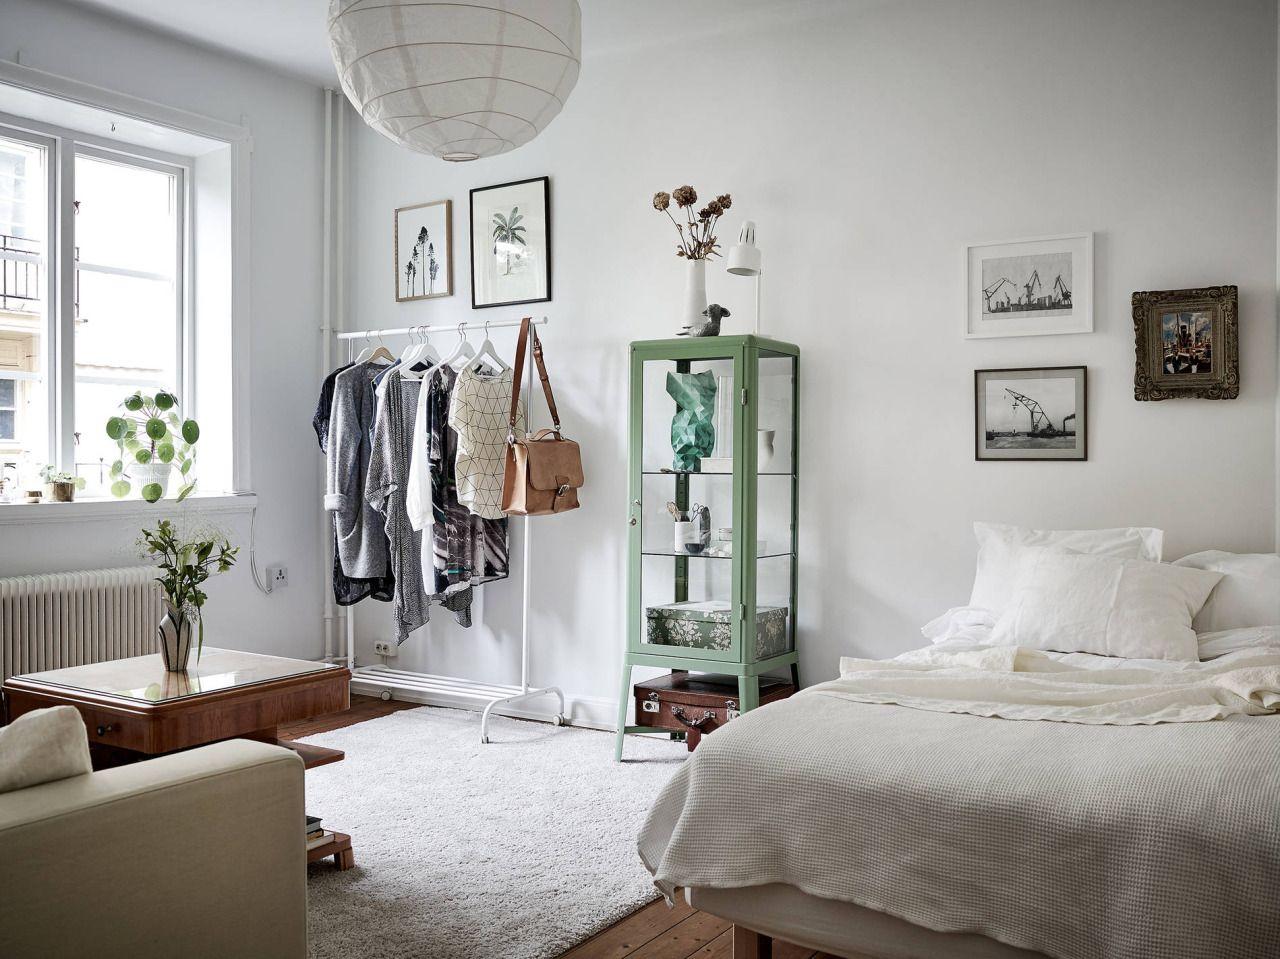 Studio Apartment With Vintage Touch Espacos Pequenos Decorando